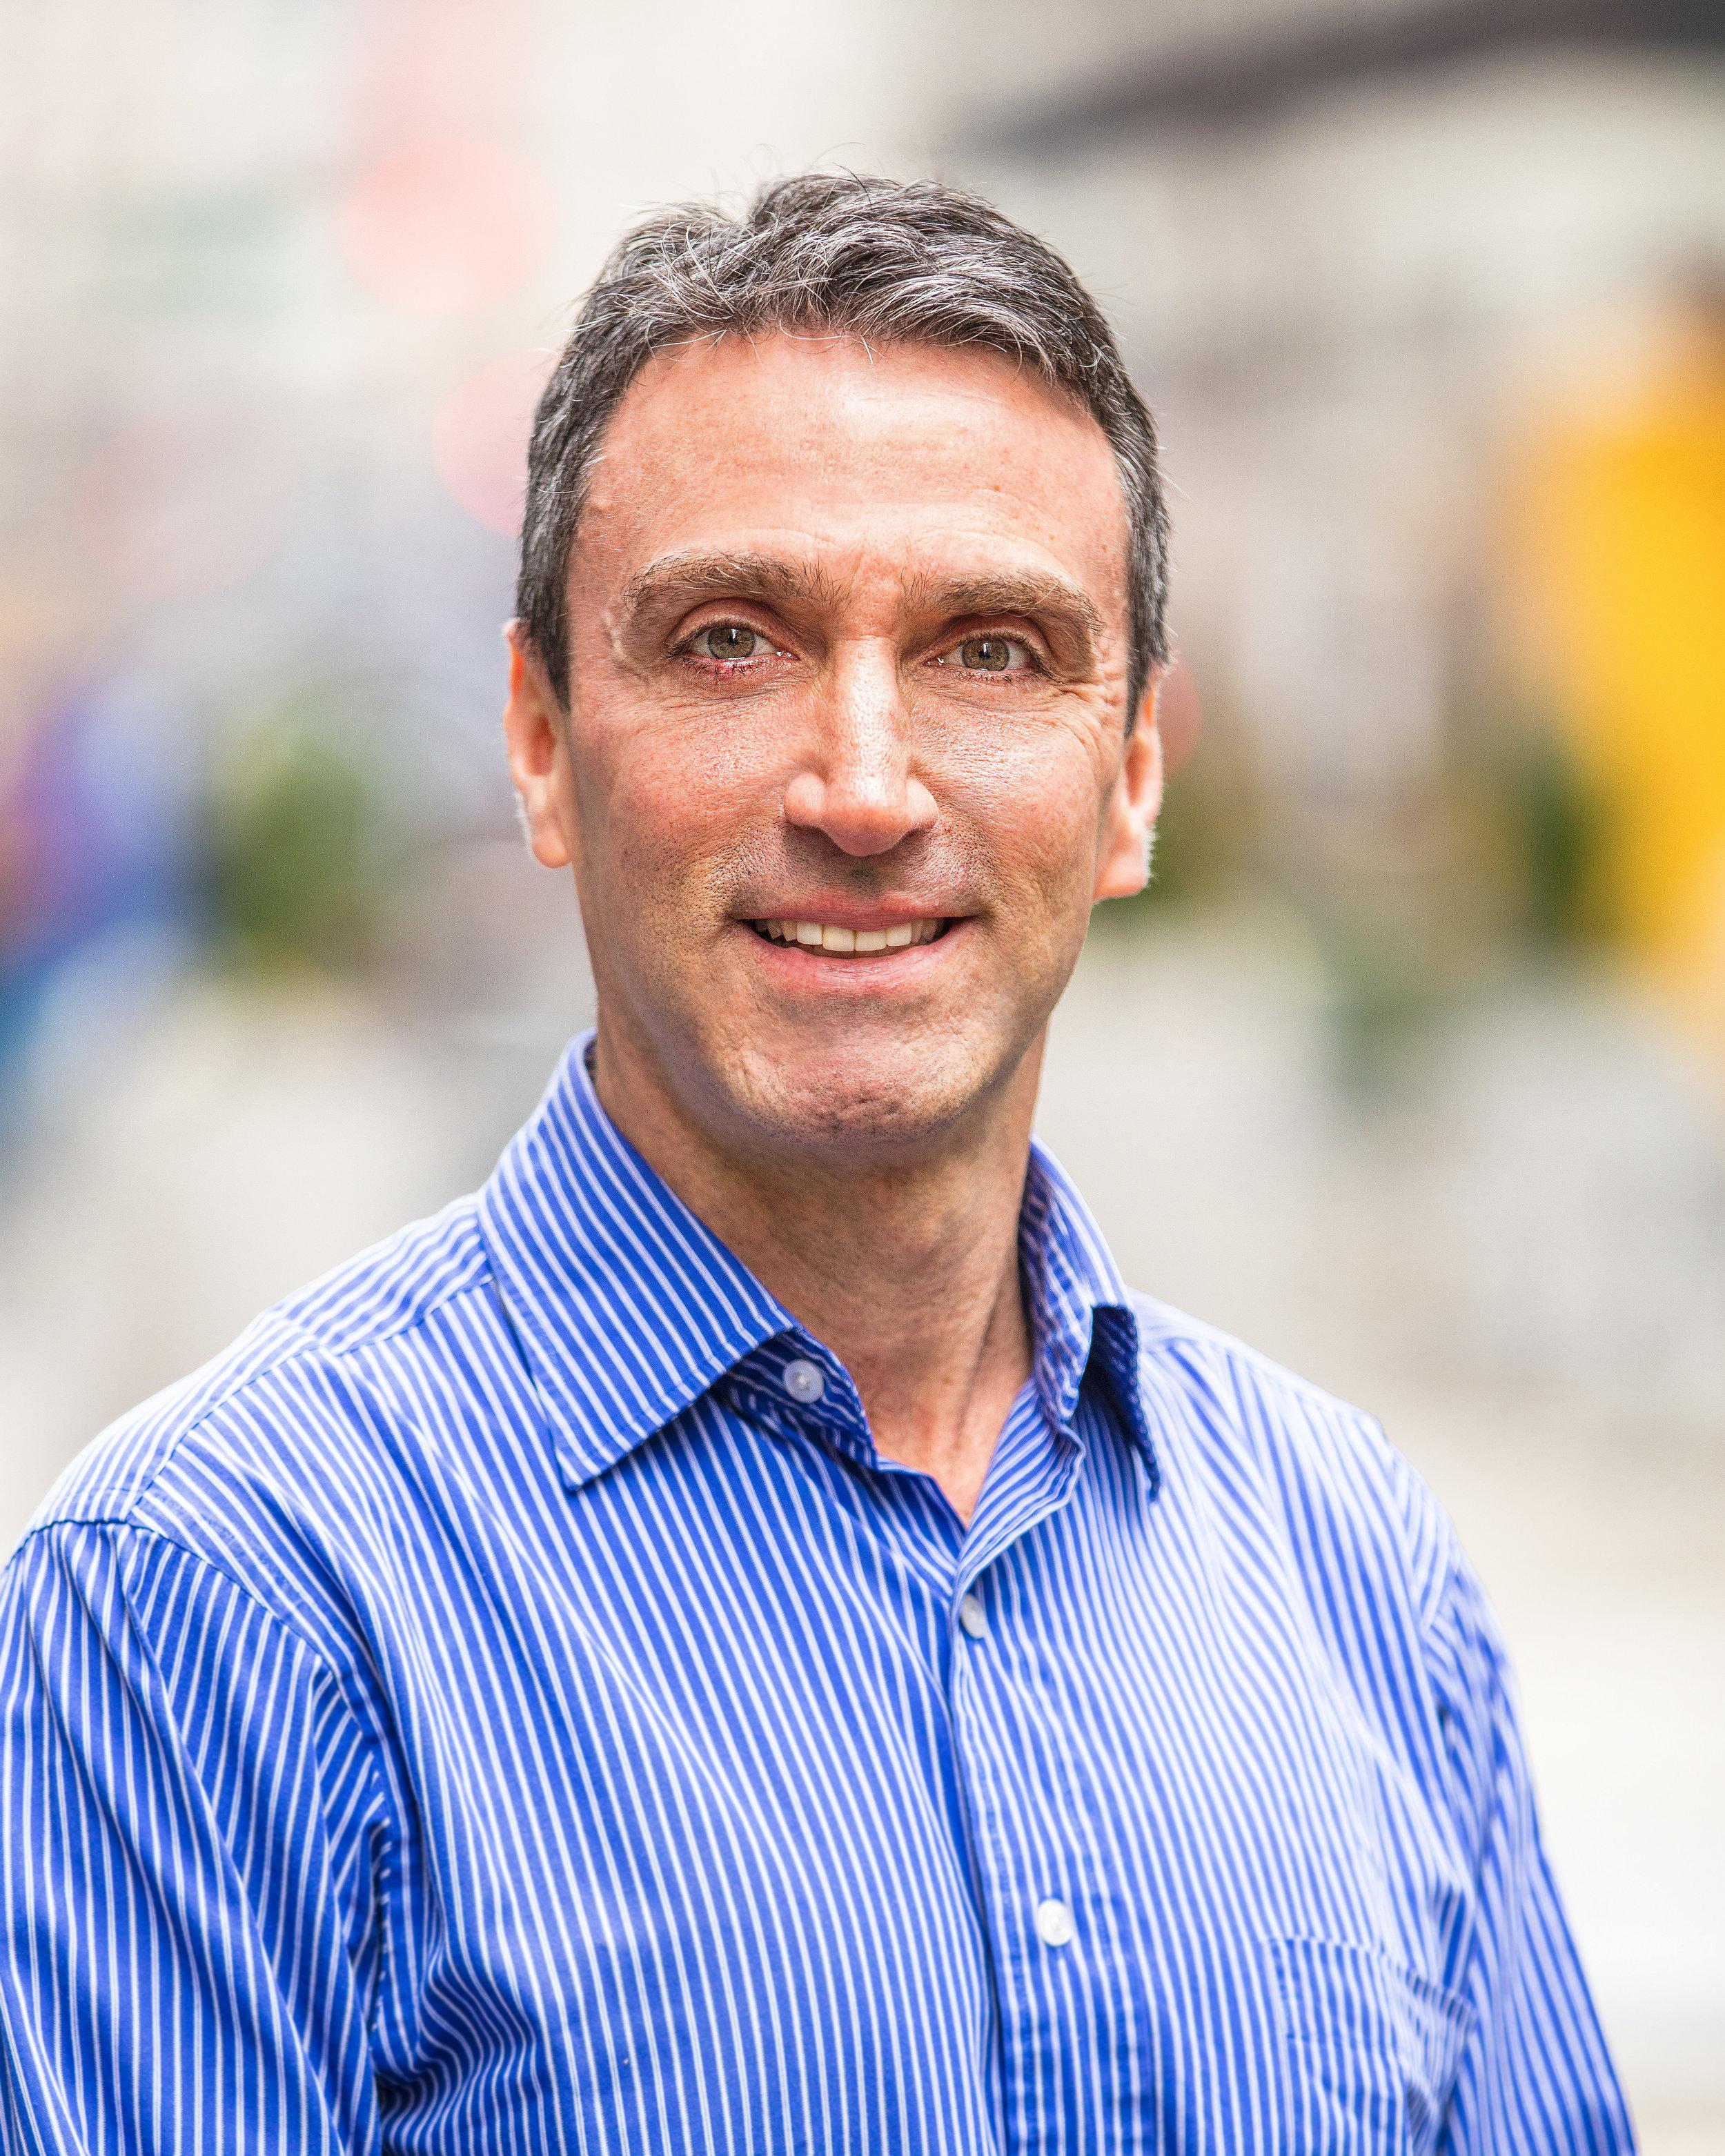 Ken Brause   Chief Financial Officer  OnDeck Capital